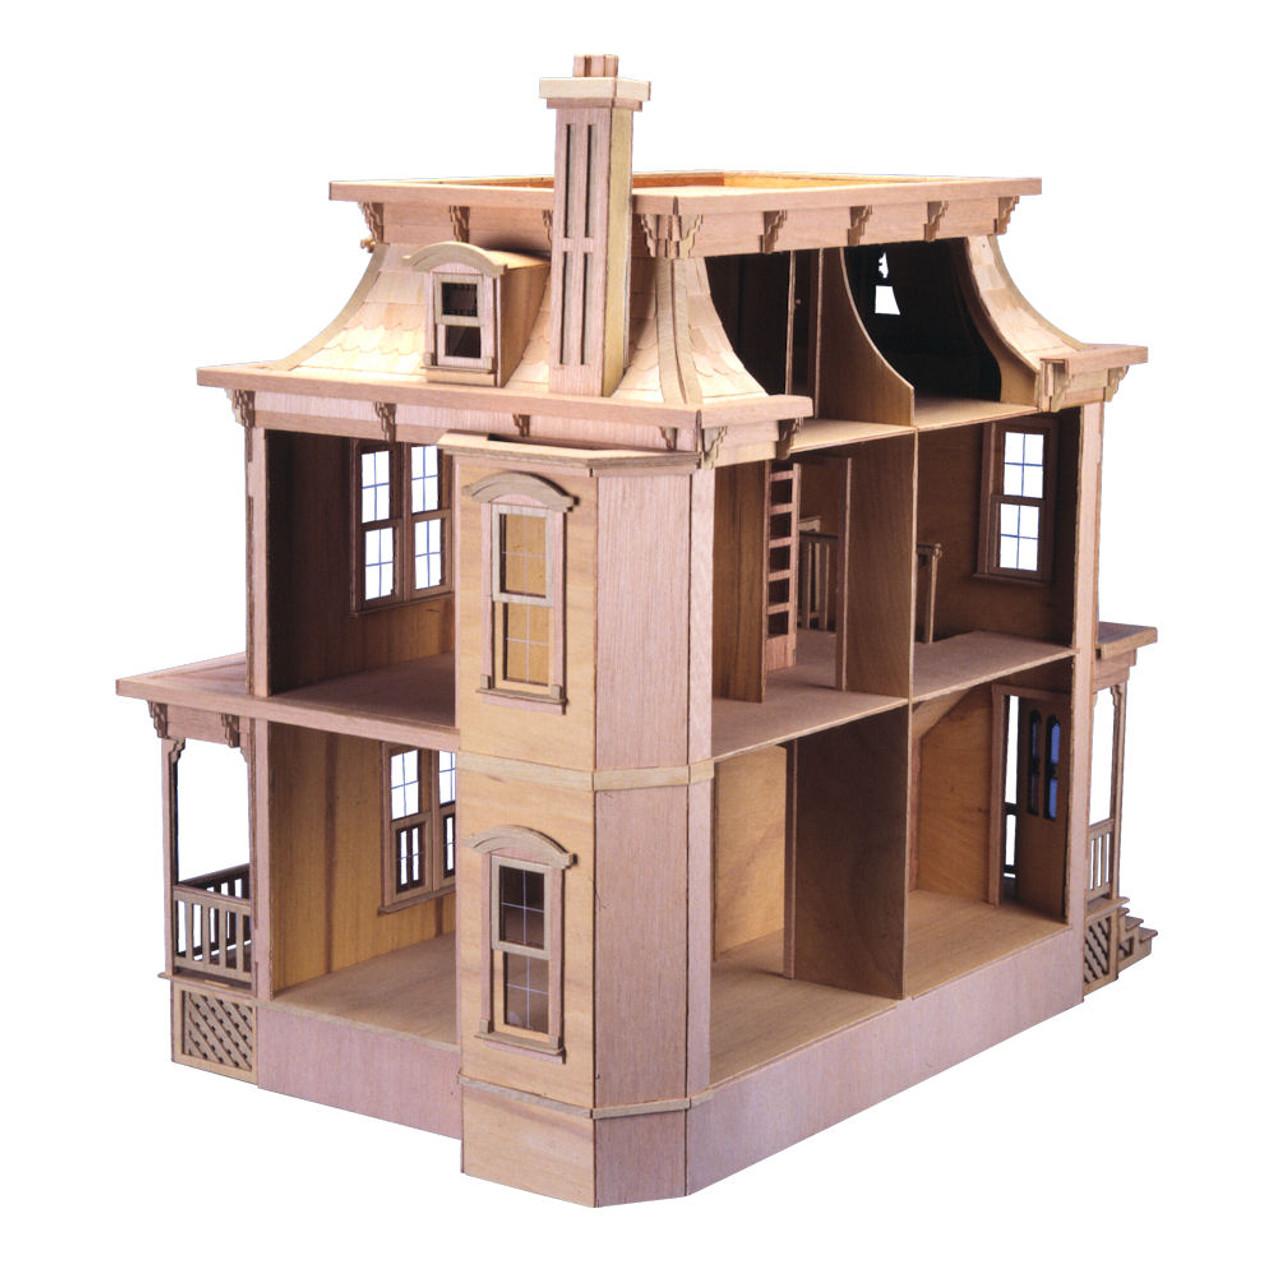 Lily dollhouse kit solutioingenieria Choice Image